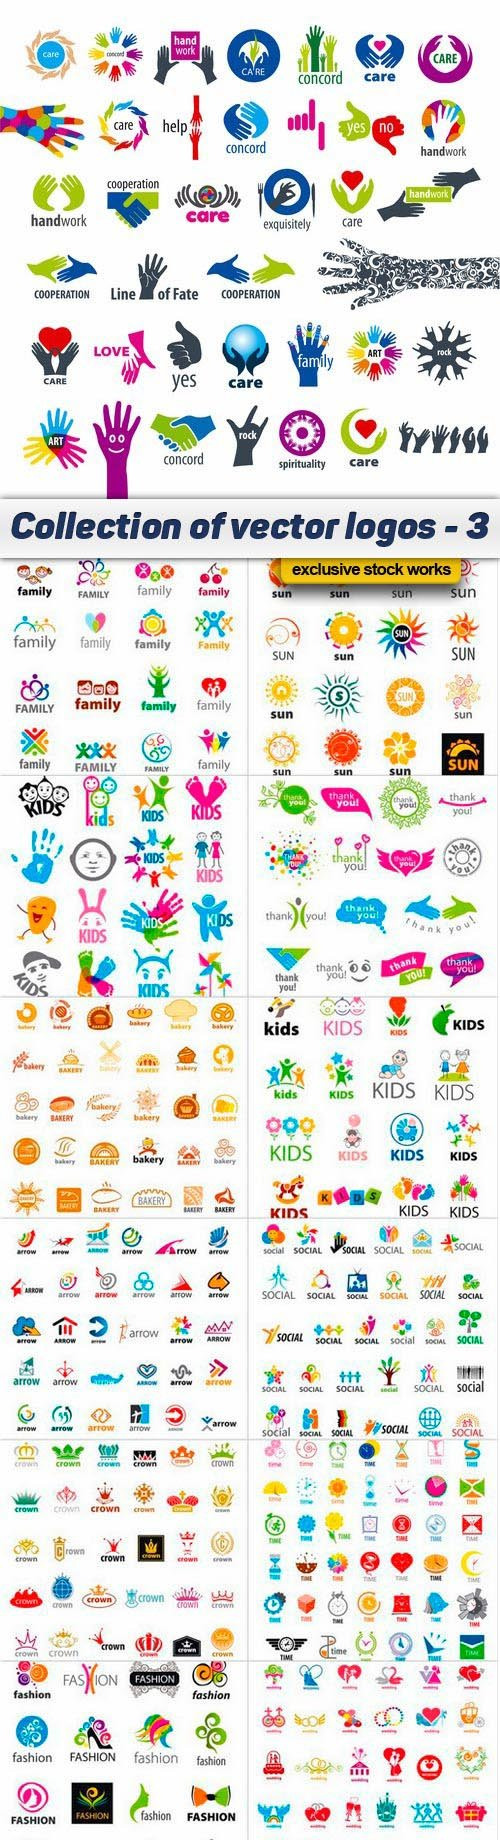 Collection of vector logos - 3 - 15 EPS